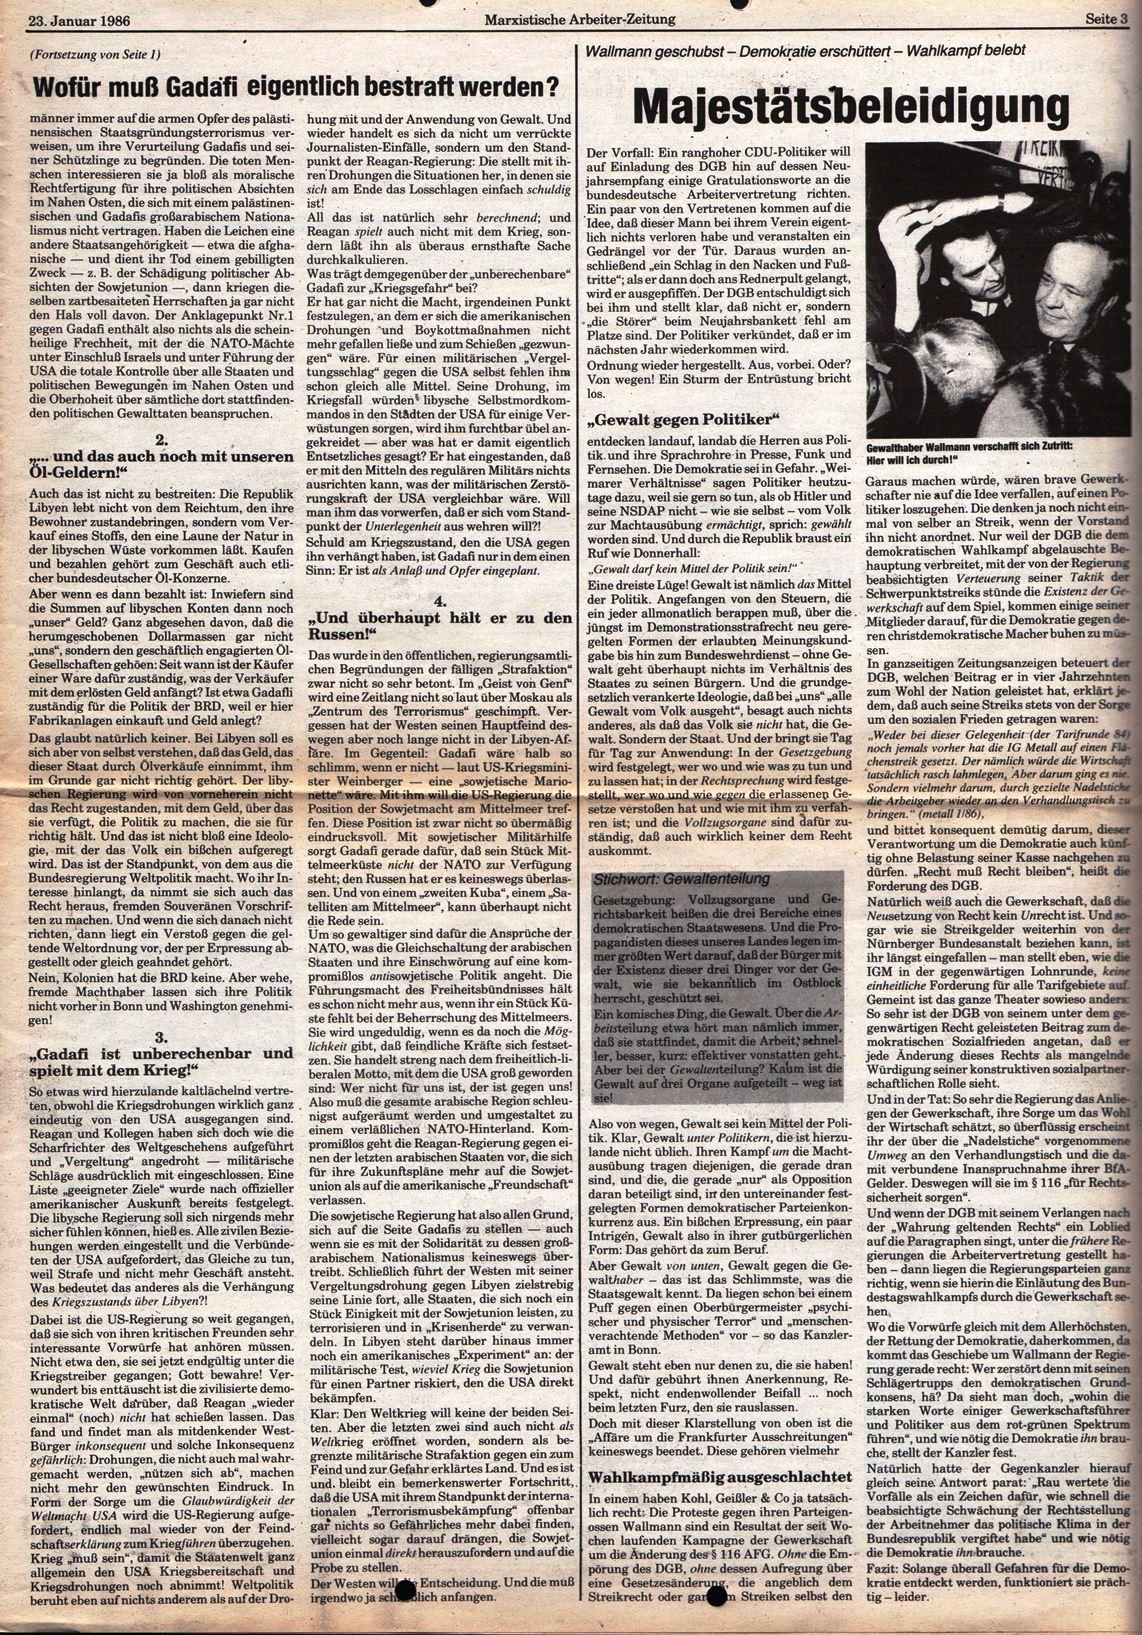 Muenchen_MG_MAZ_Krauss_Maffei_19860123_03